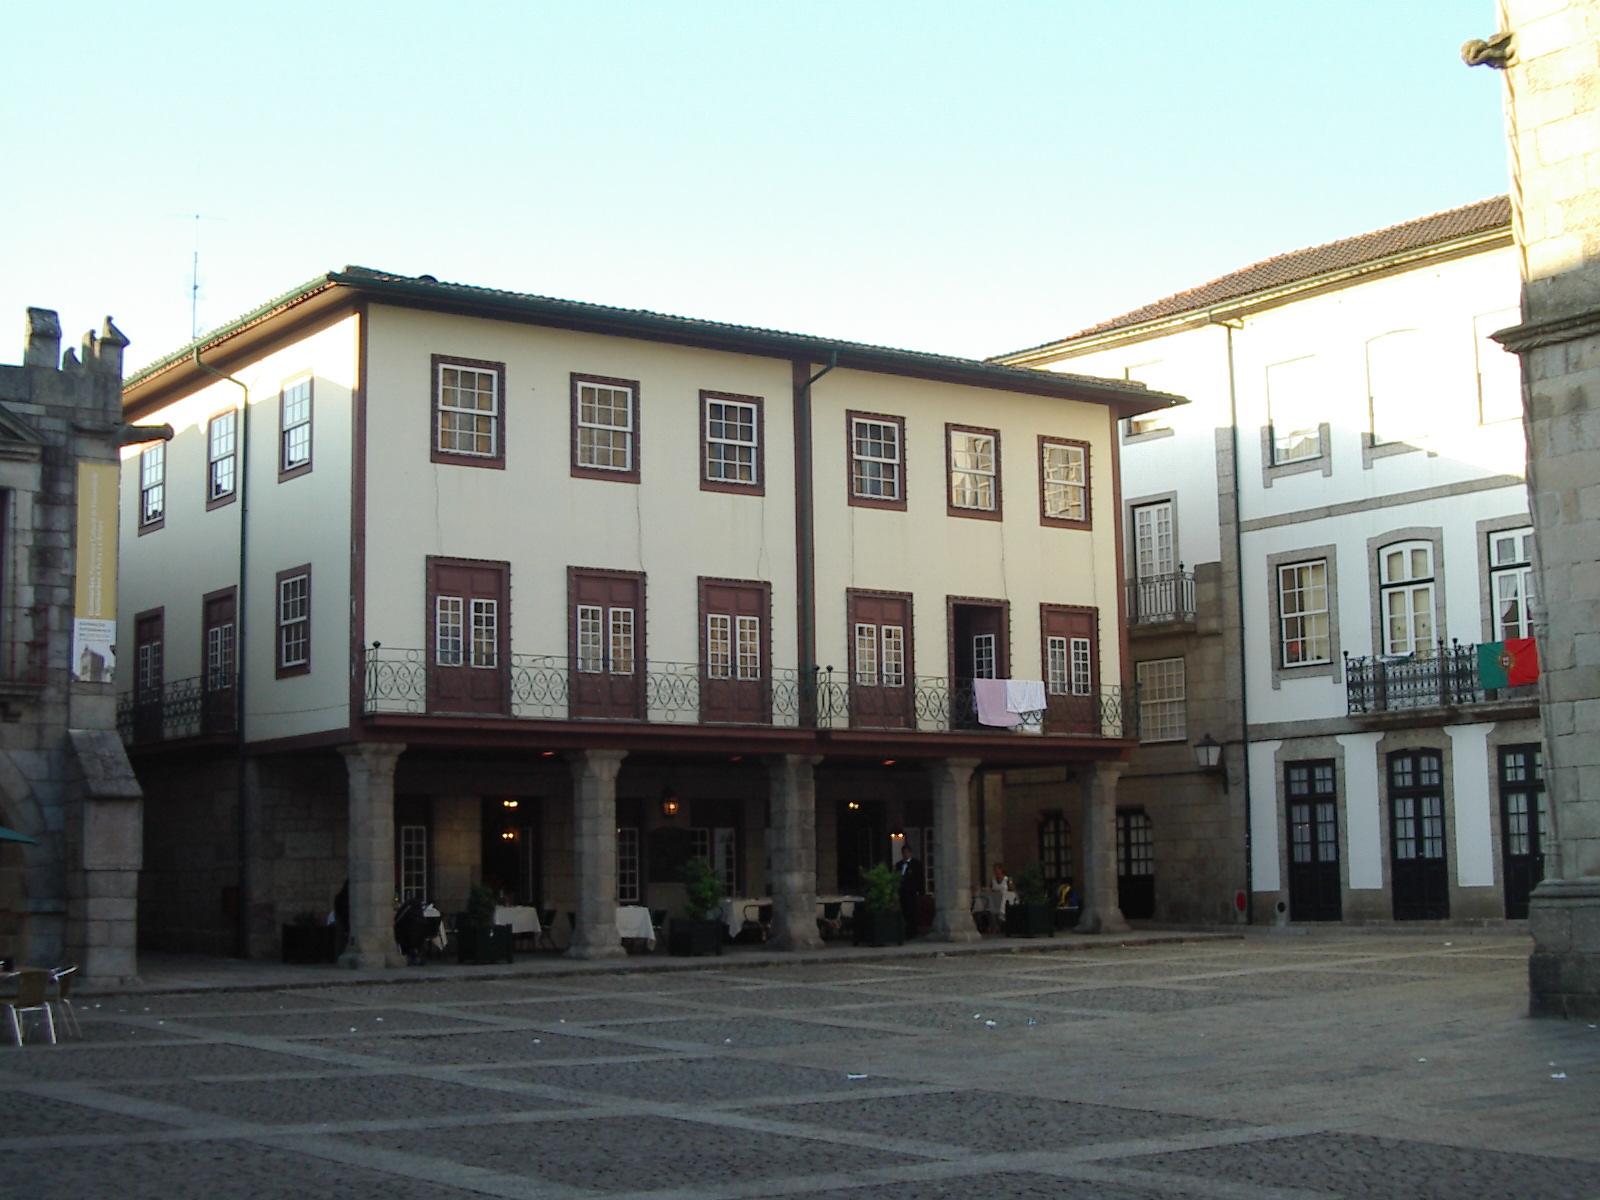 Pousada a Guimaraes